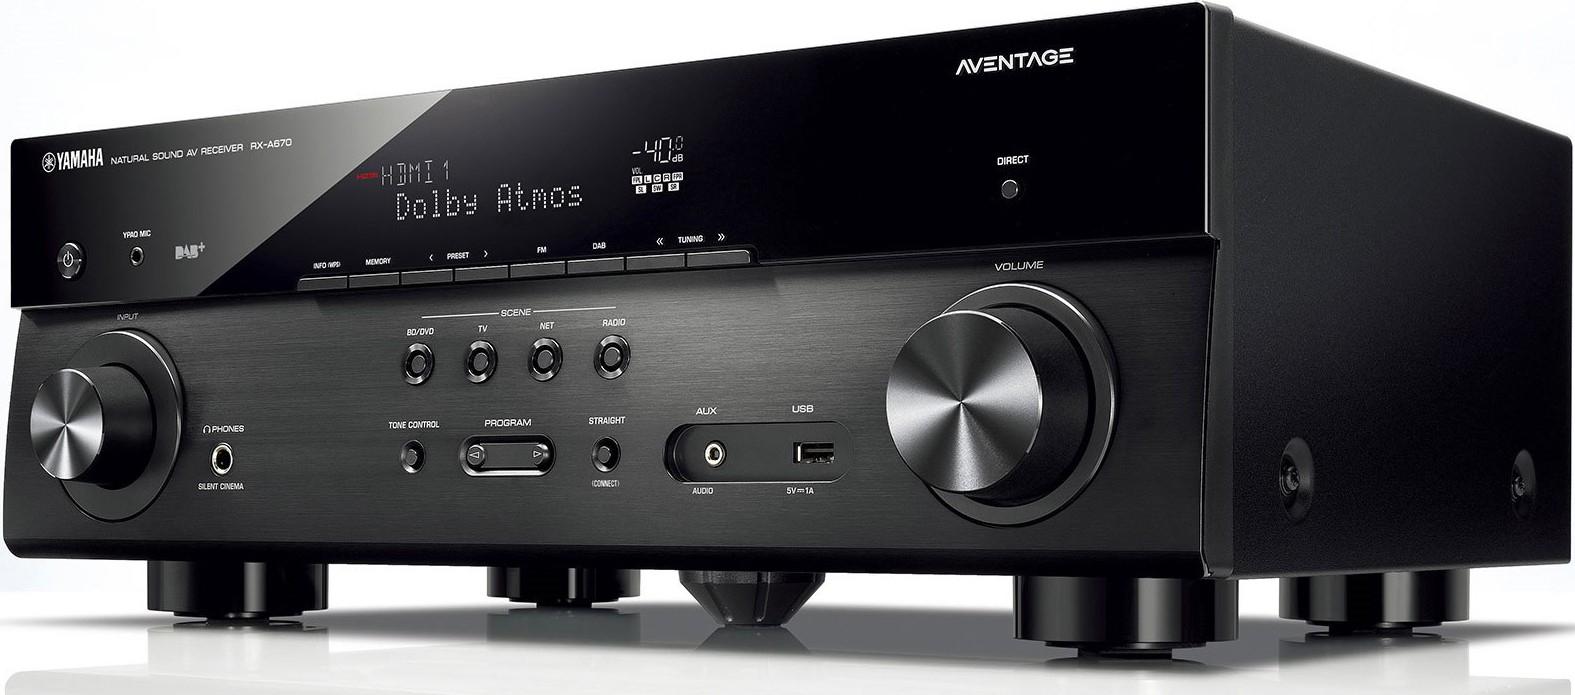 Amplificateur Home Cinéma 7.2 Yamaha Aventage RX-A670 - Wifi, Bluetooth, Dolby Atmos 5.2.2, DTS:X